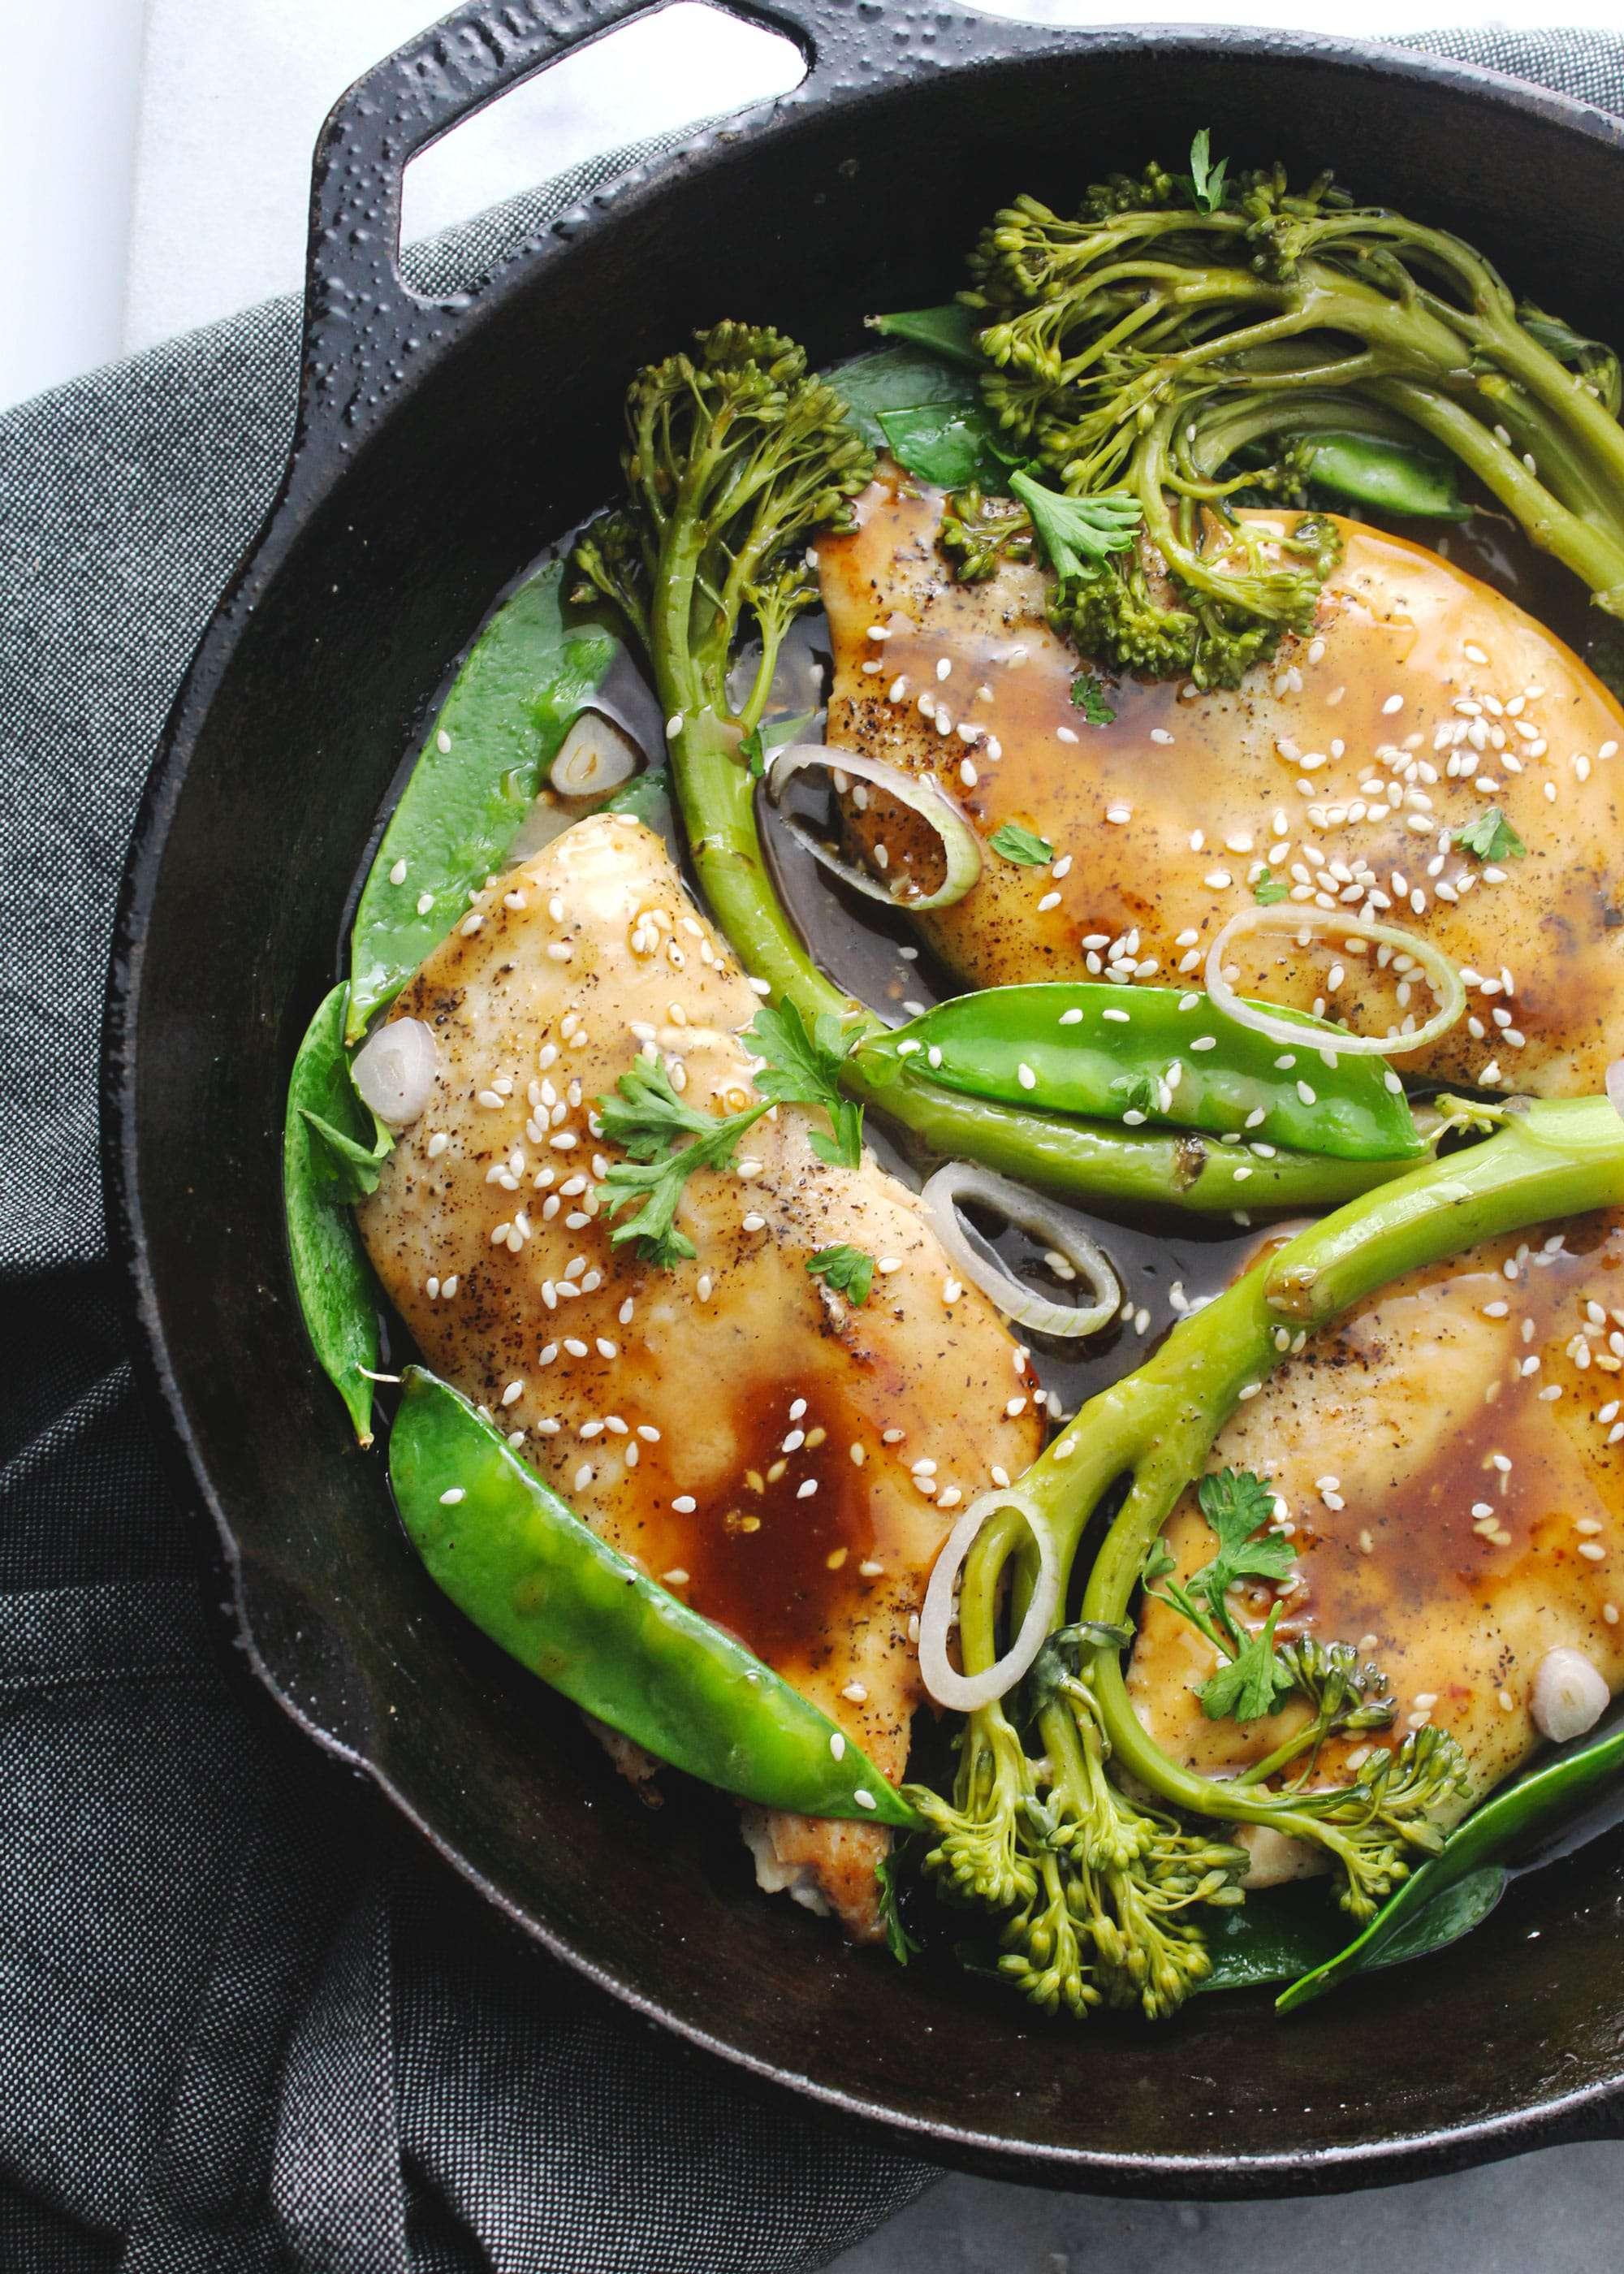 Sesame honey glazed chicken with broccolini in a black skillet.